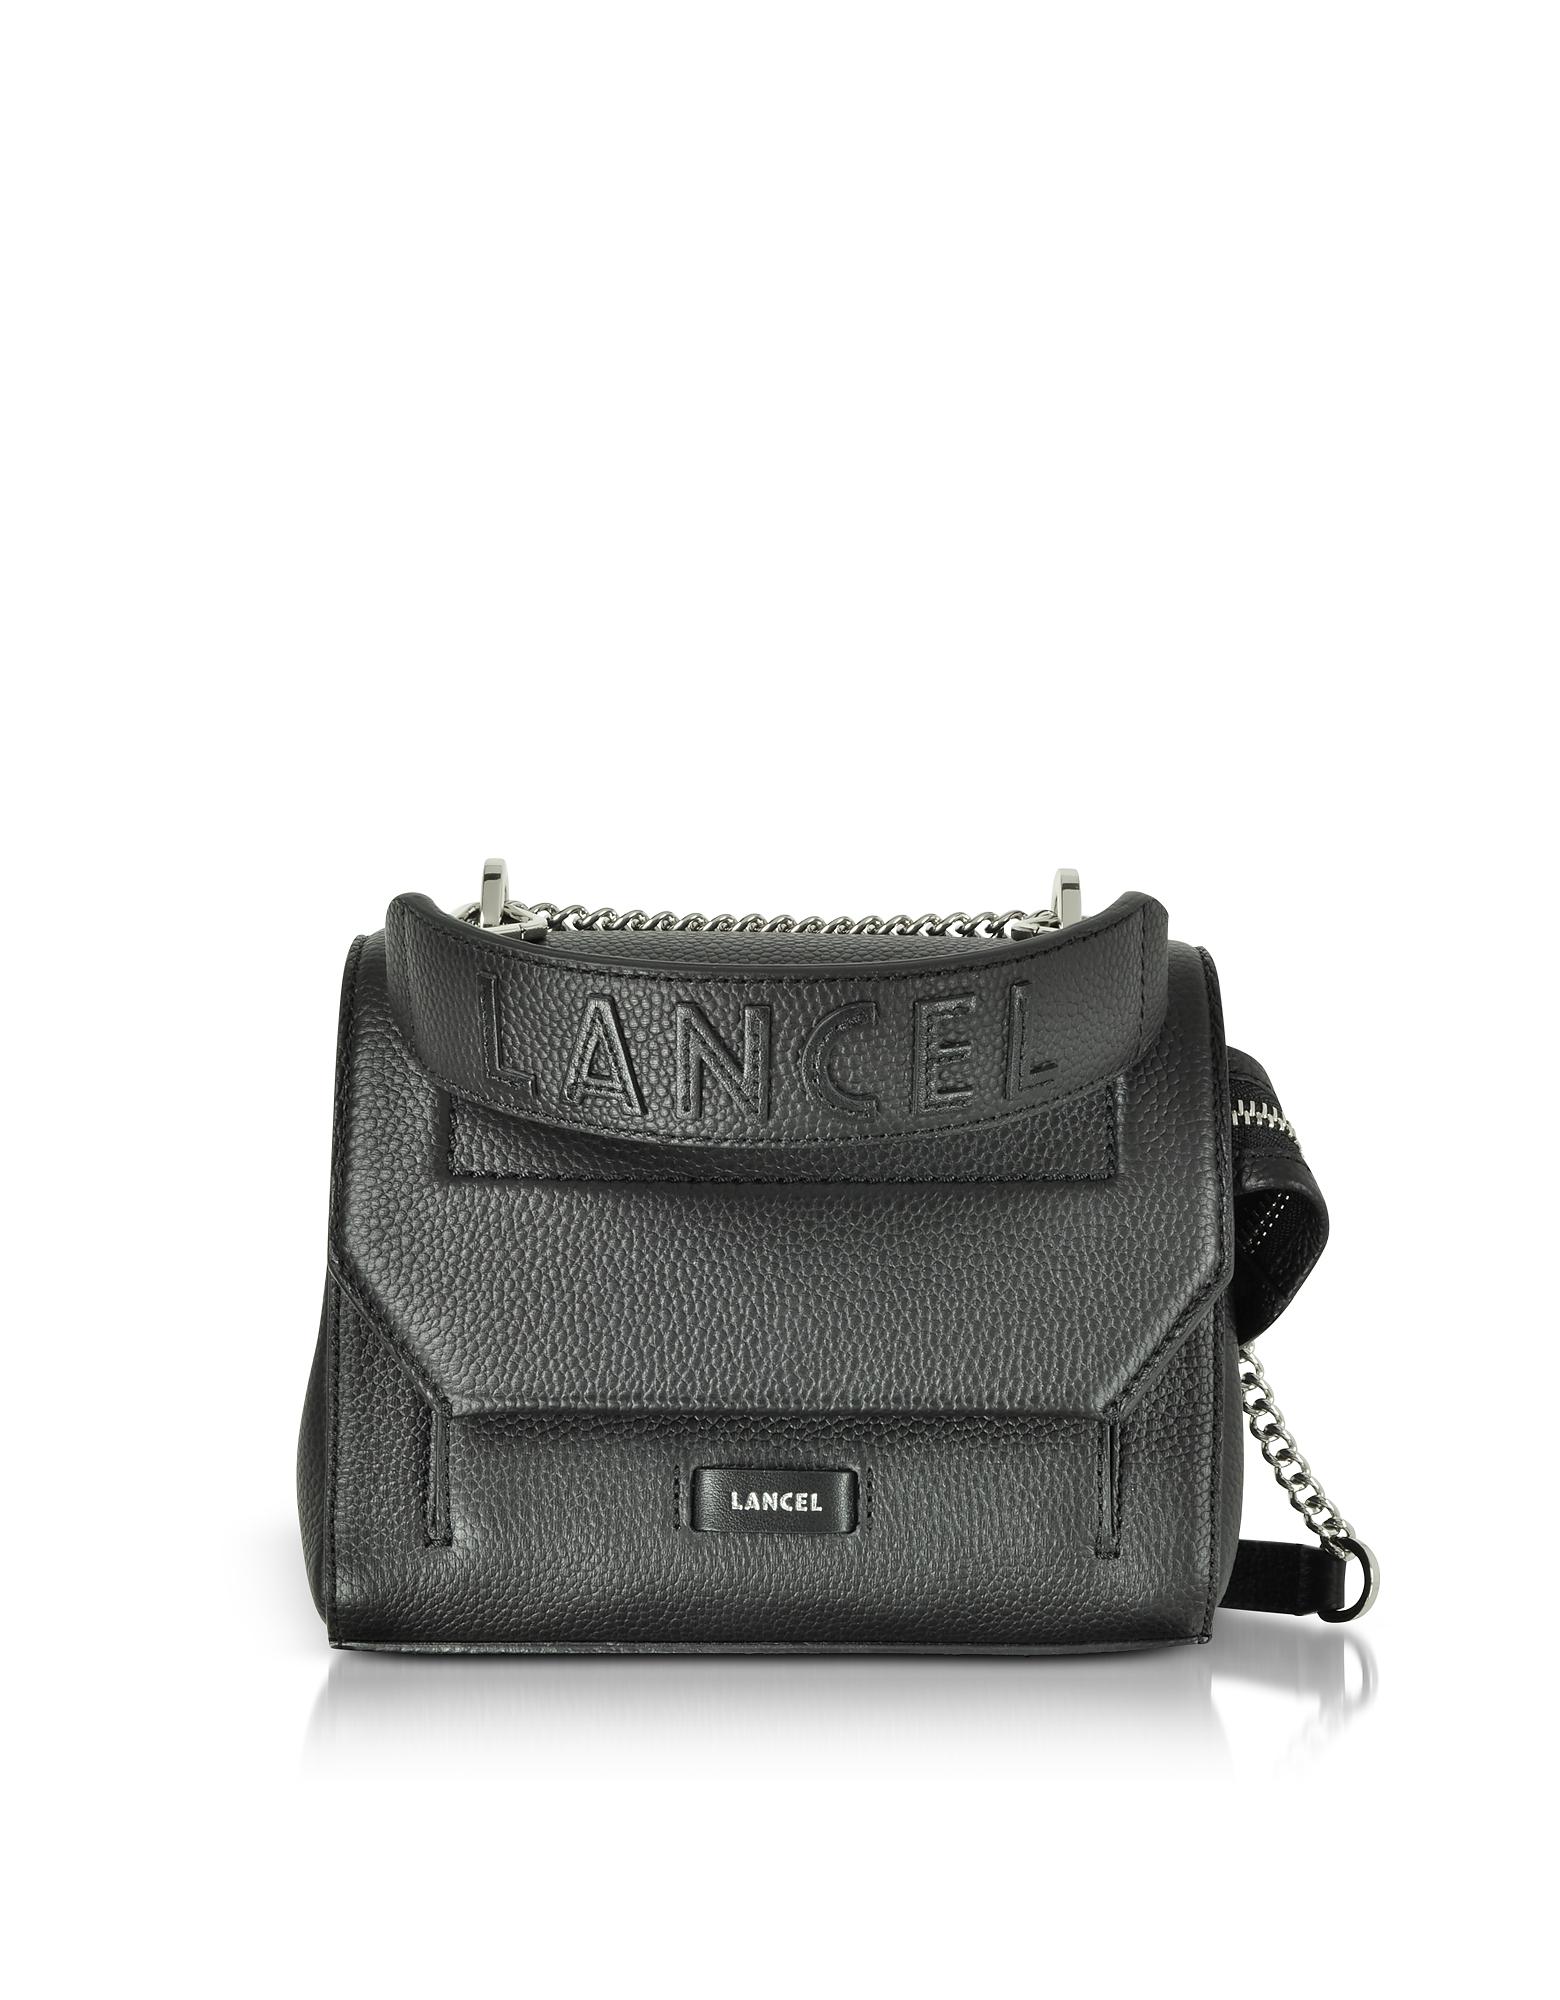 Image of Lancel Designer Handbags, Ninon Round Leather Small Flap Bag